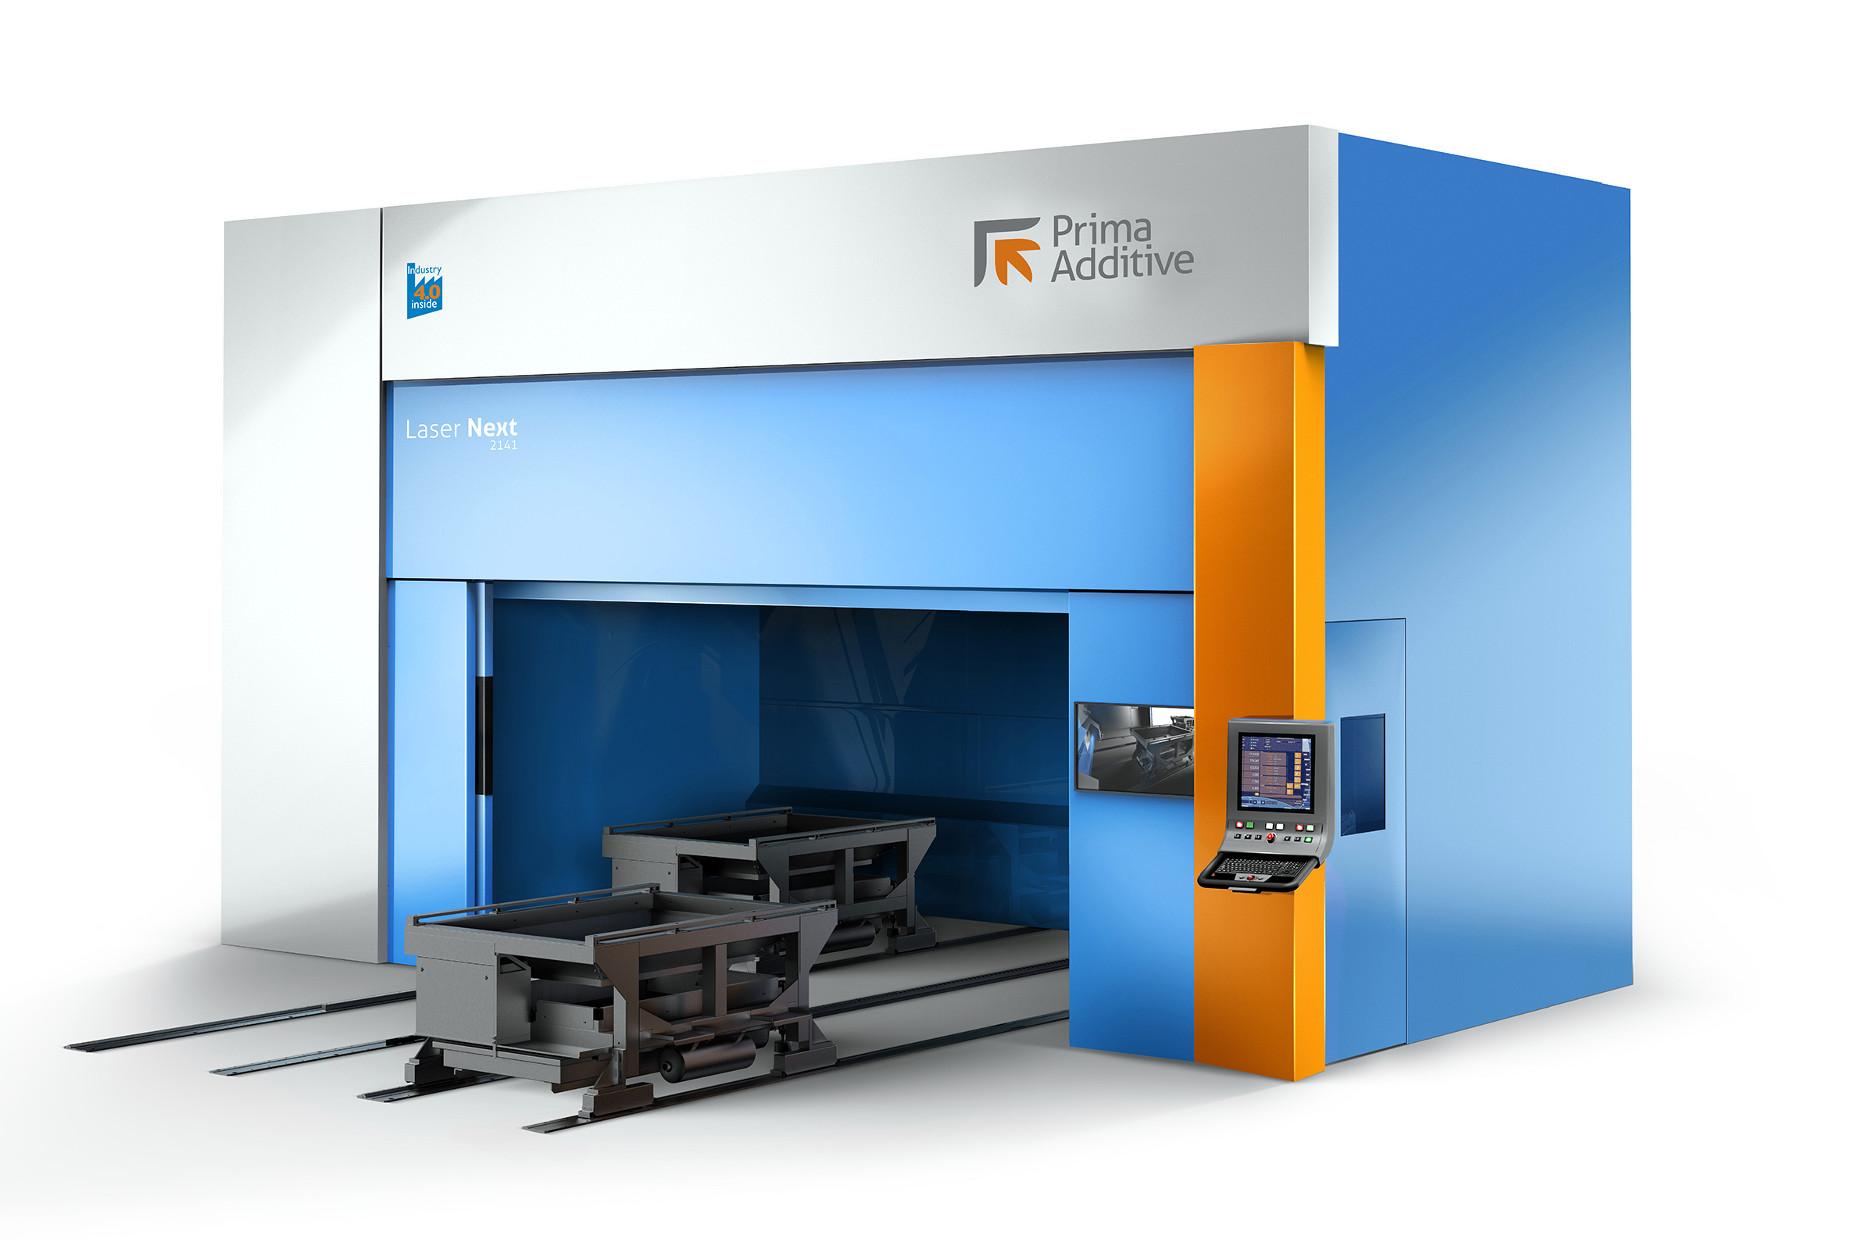 Laser Next 2141 Prima Additive - Metal